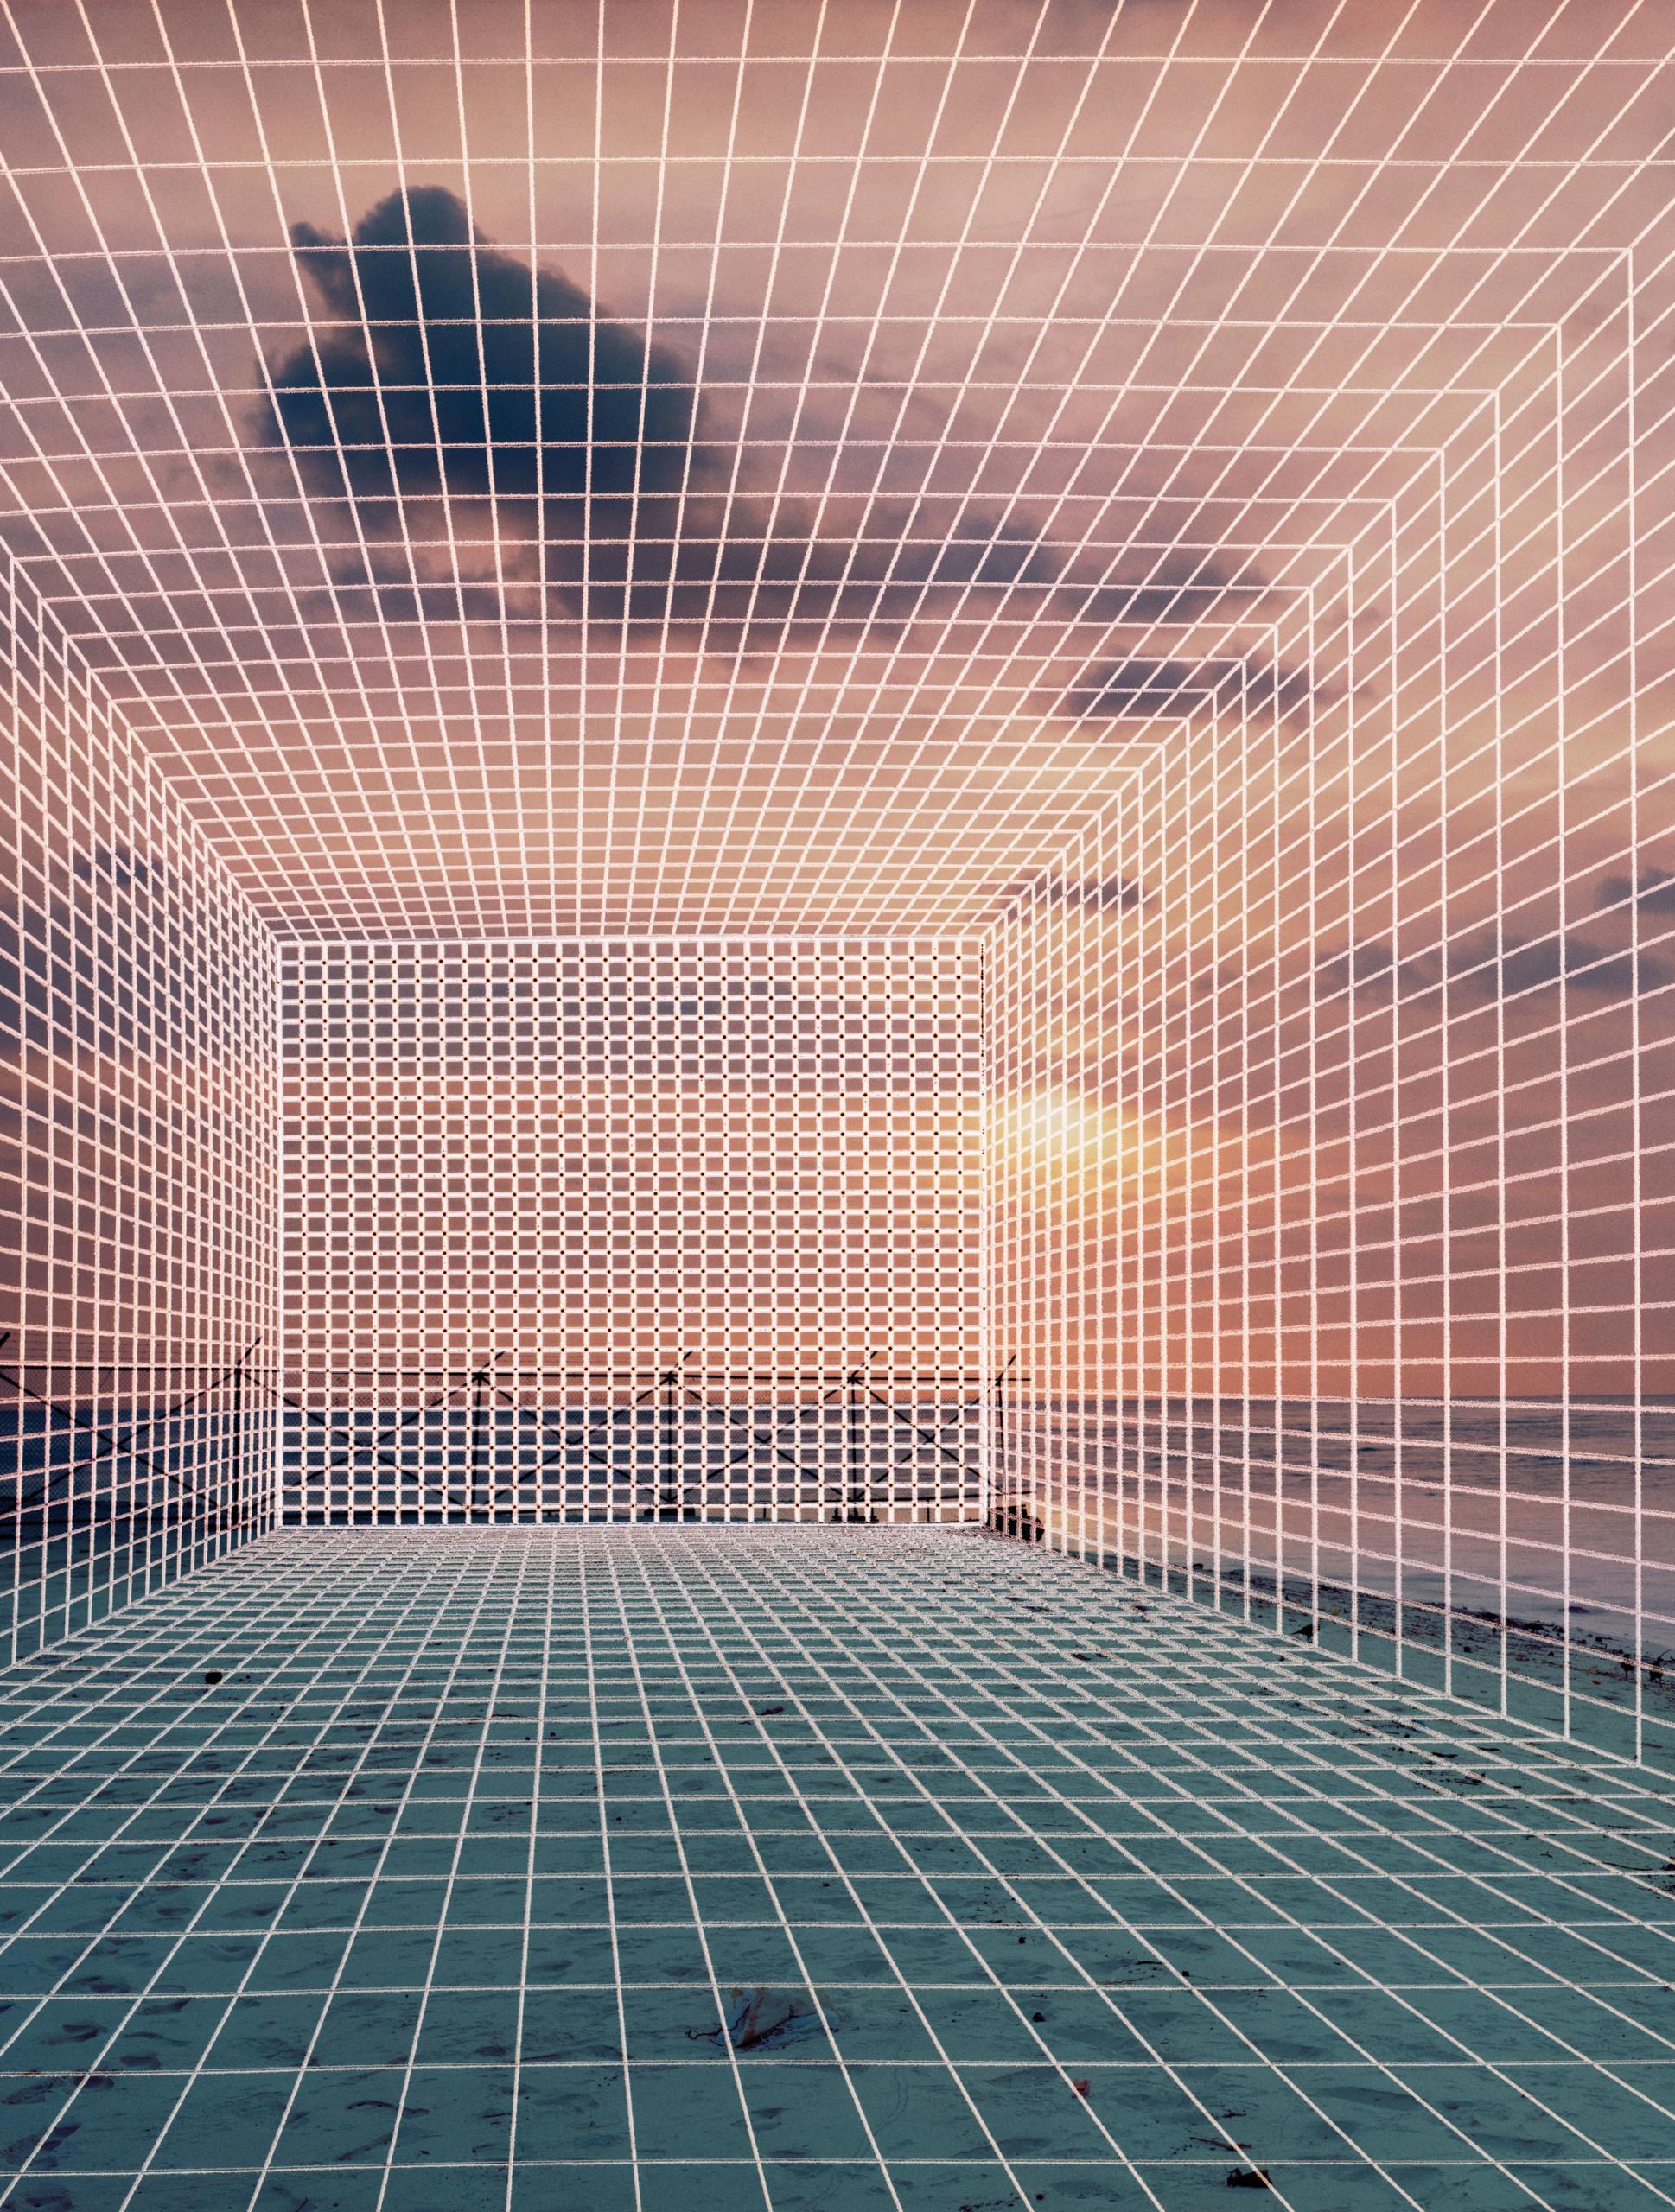 Taiyo Onorato & Nico Krebs, X5, 2019. Courtesy of the artists and Sies+Hoeke